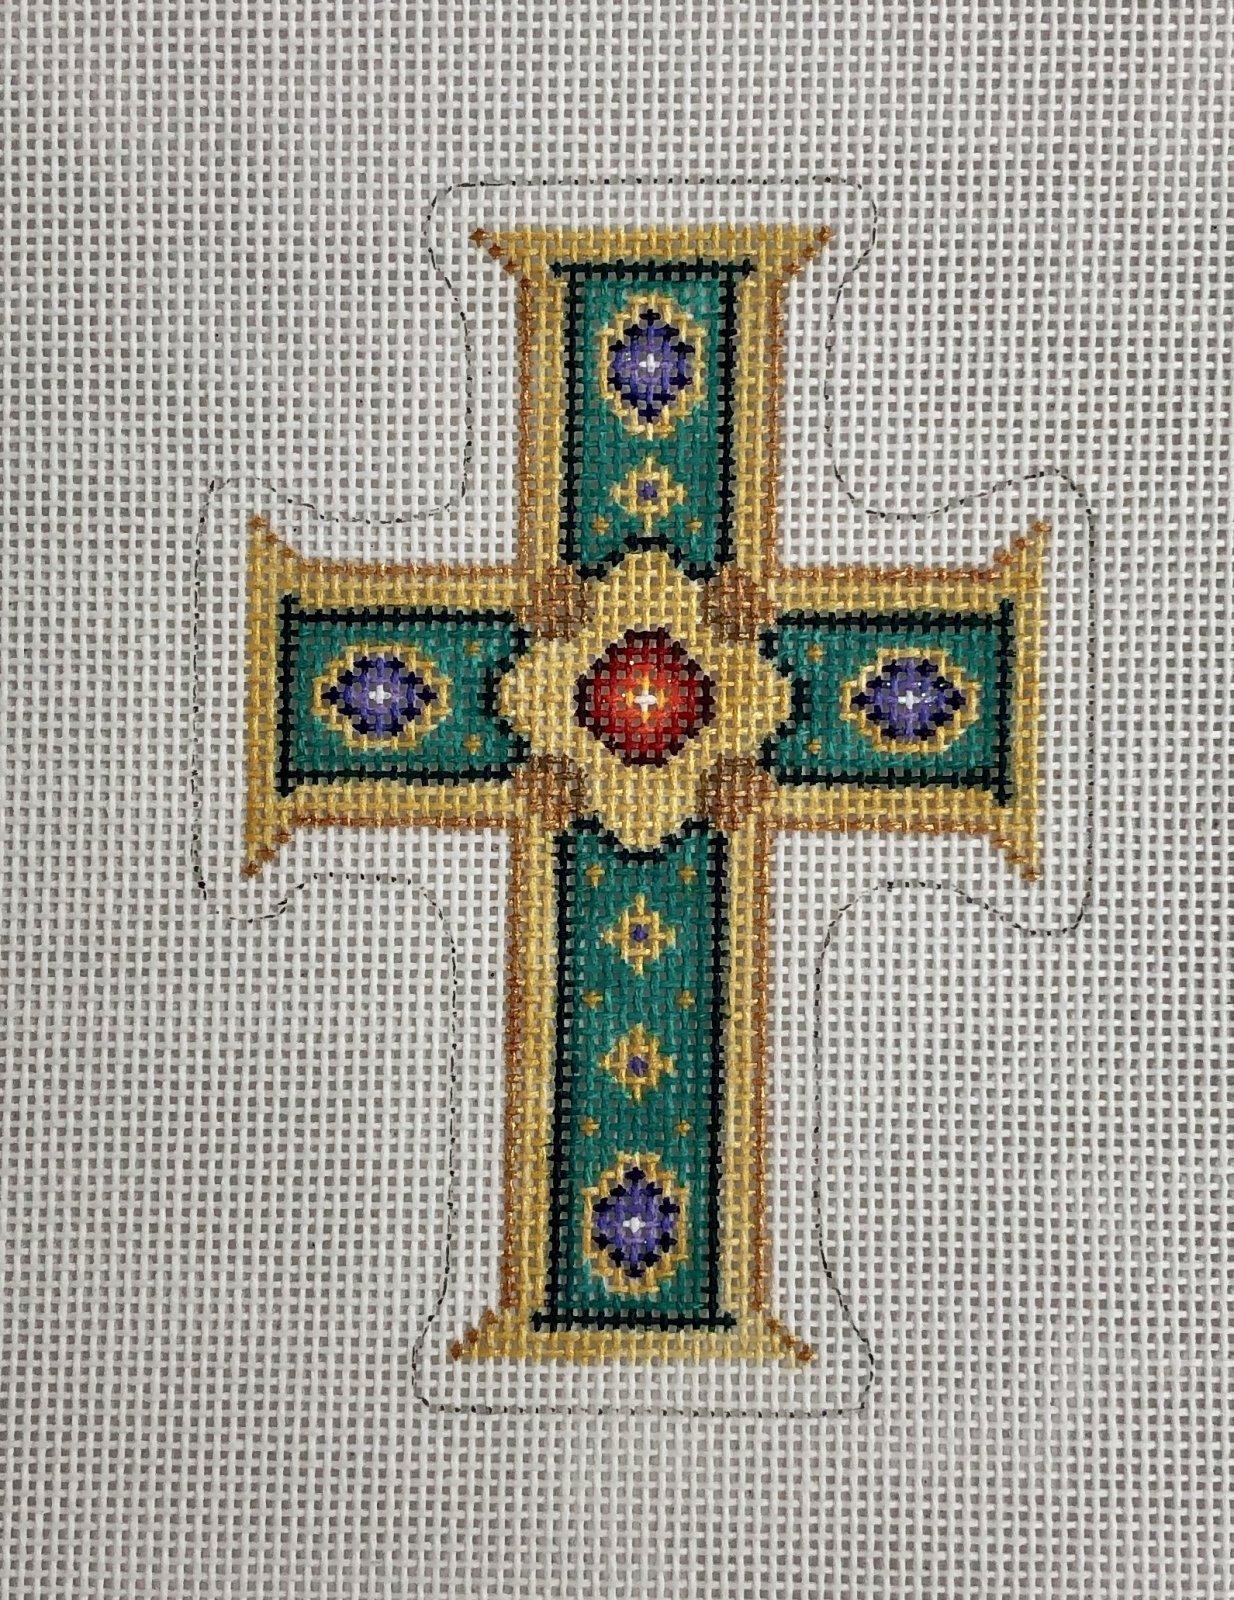 cross aqua & gold, purple, red jewels